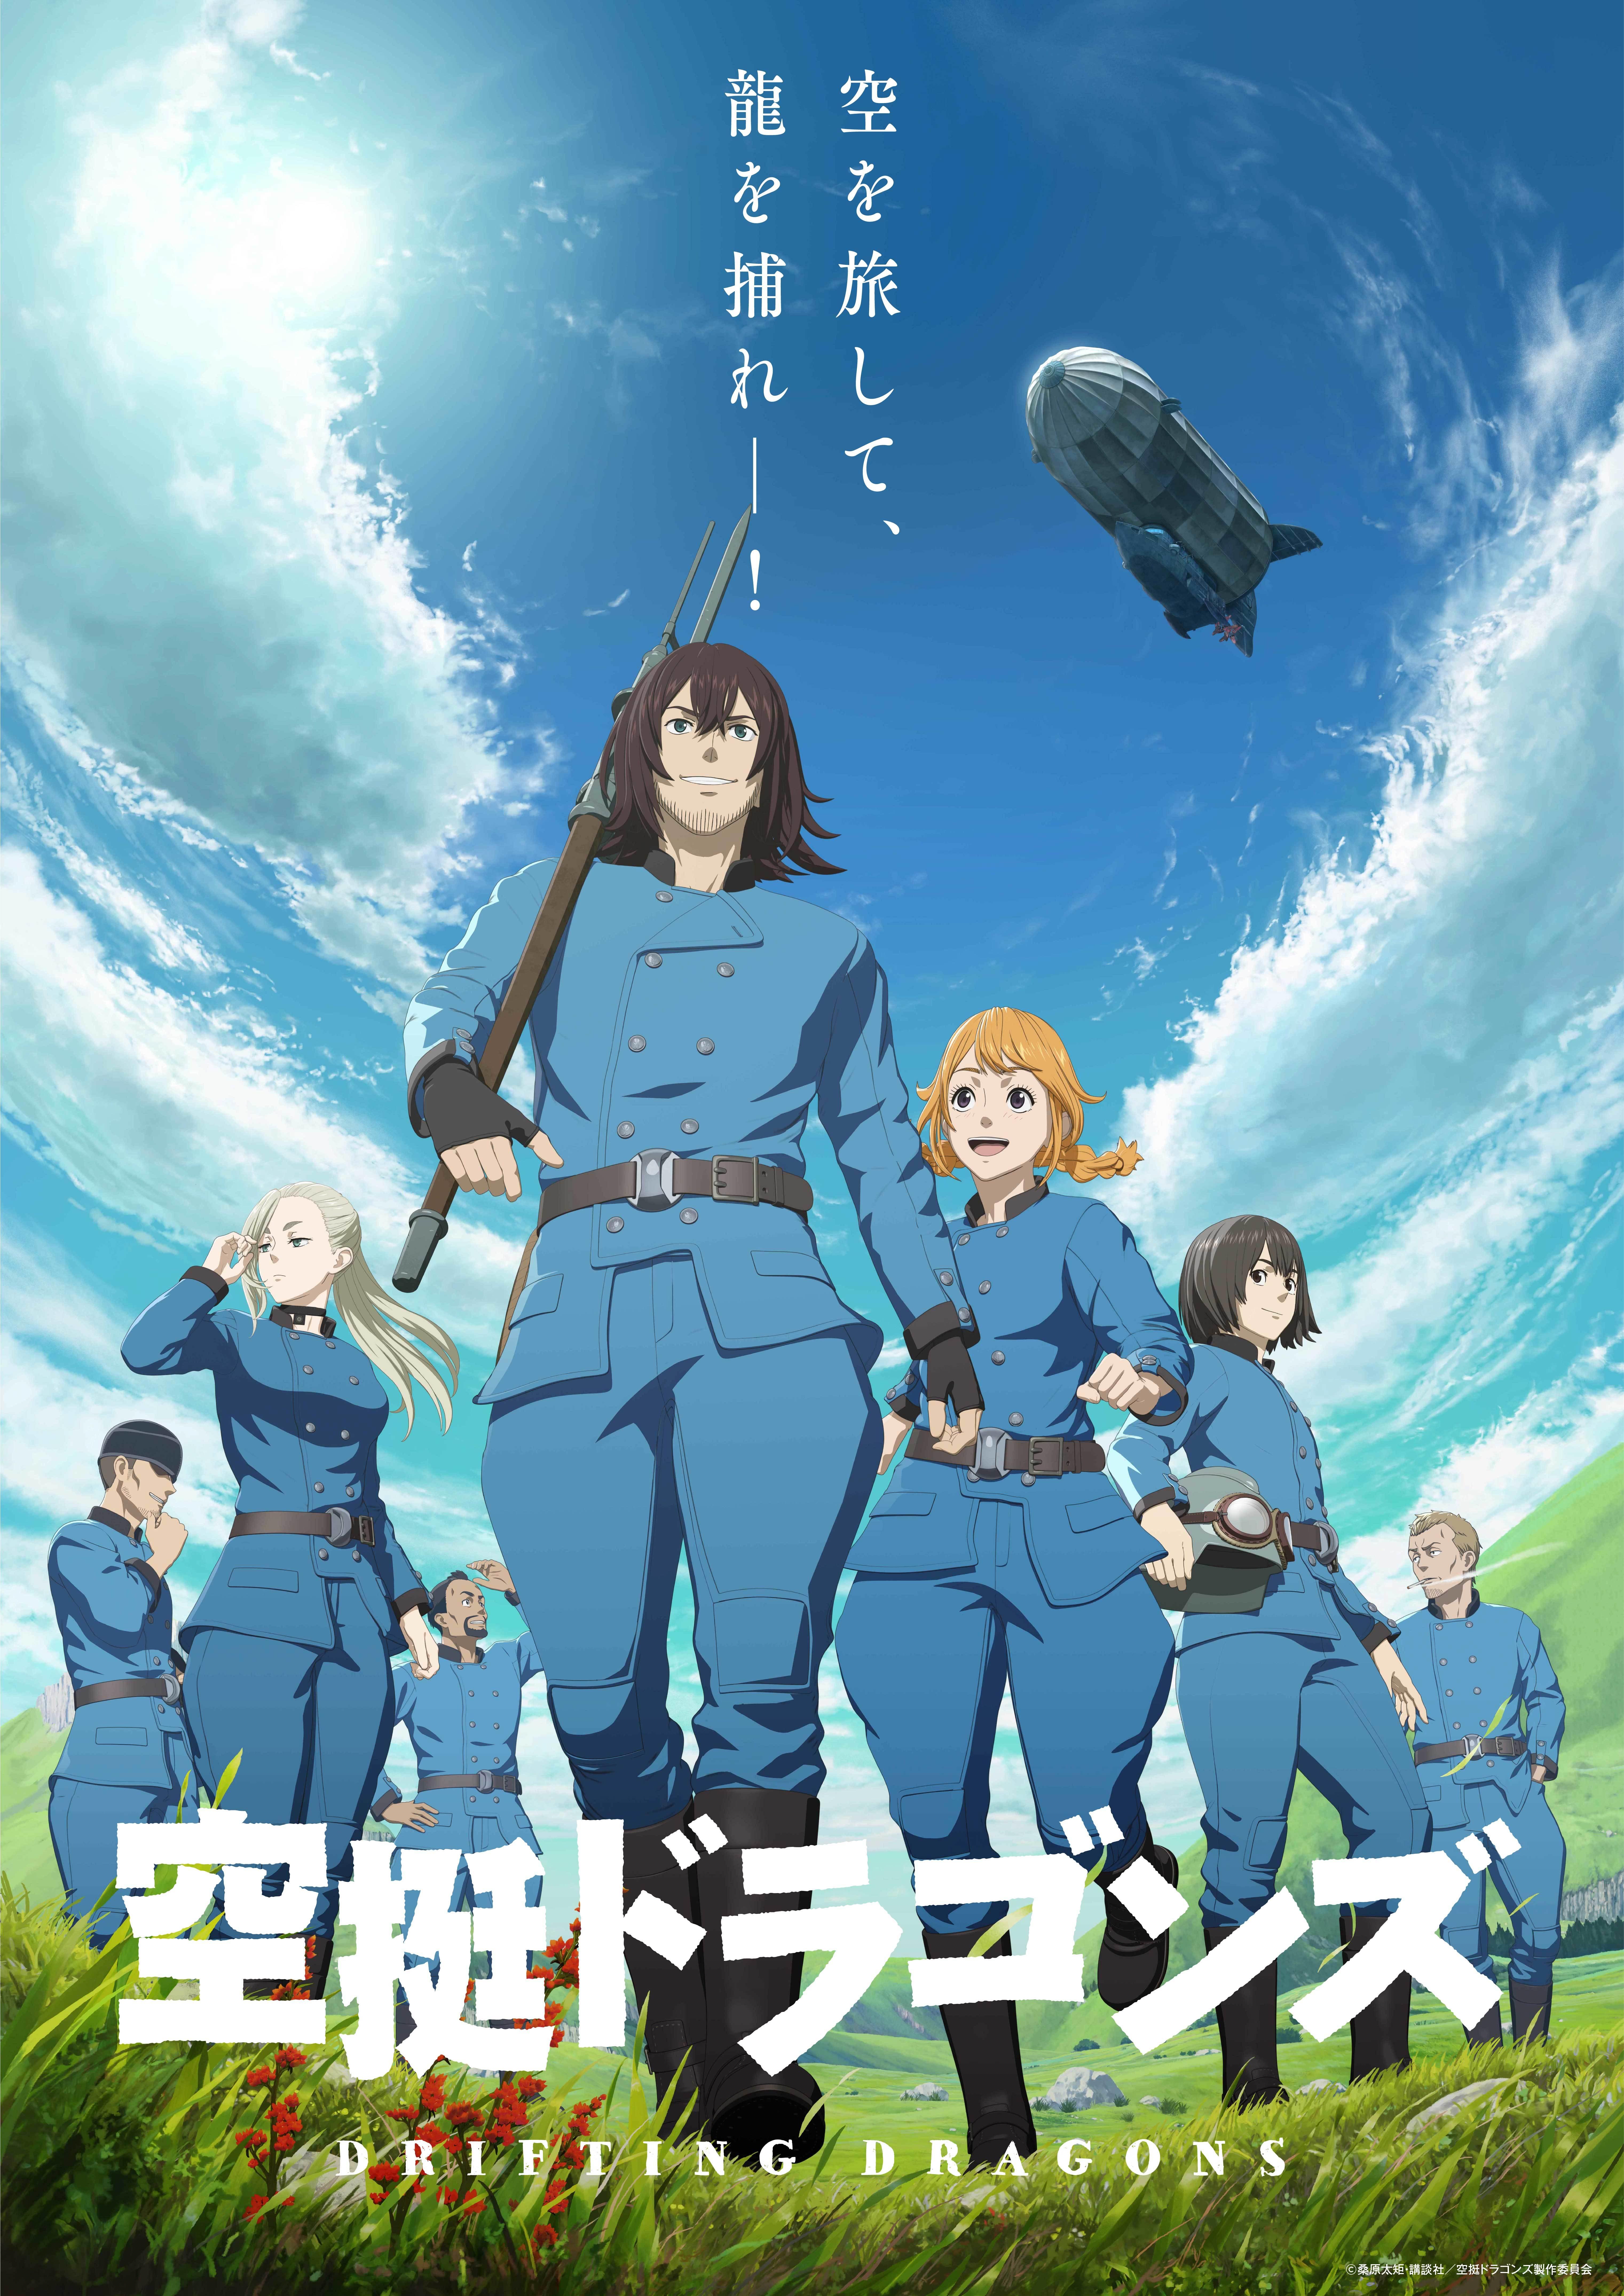 TVアニメ『空挺ドラゴンズ』 (C)桑原太矩・講談社/空挺ドラゴンズ製作委員会